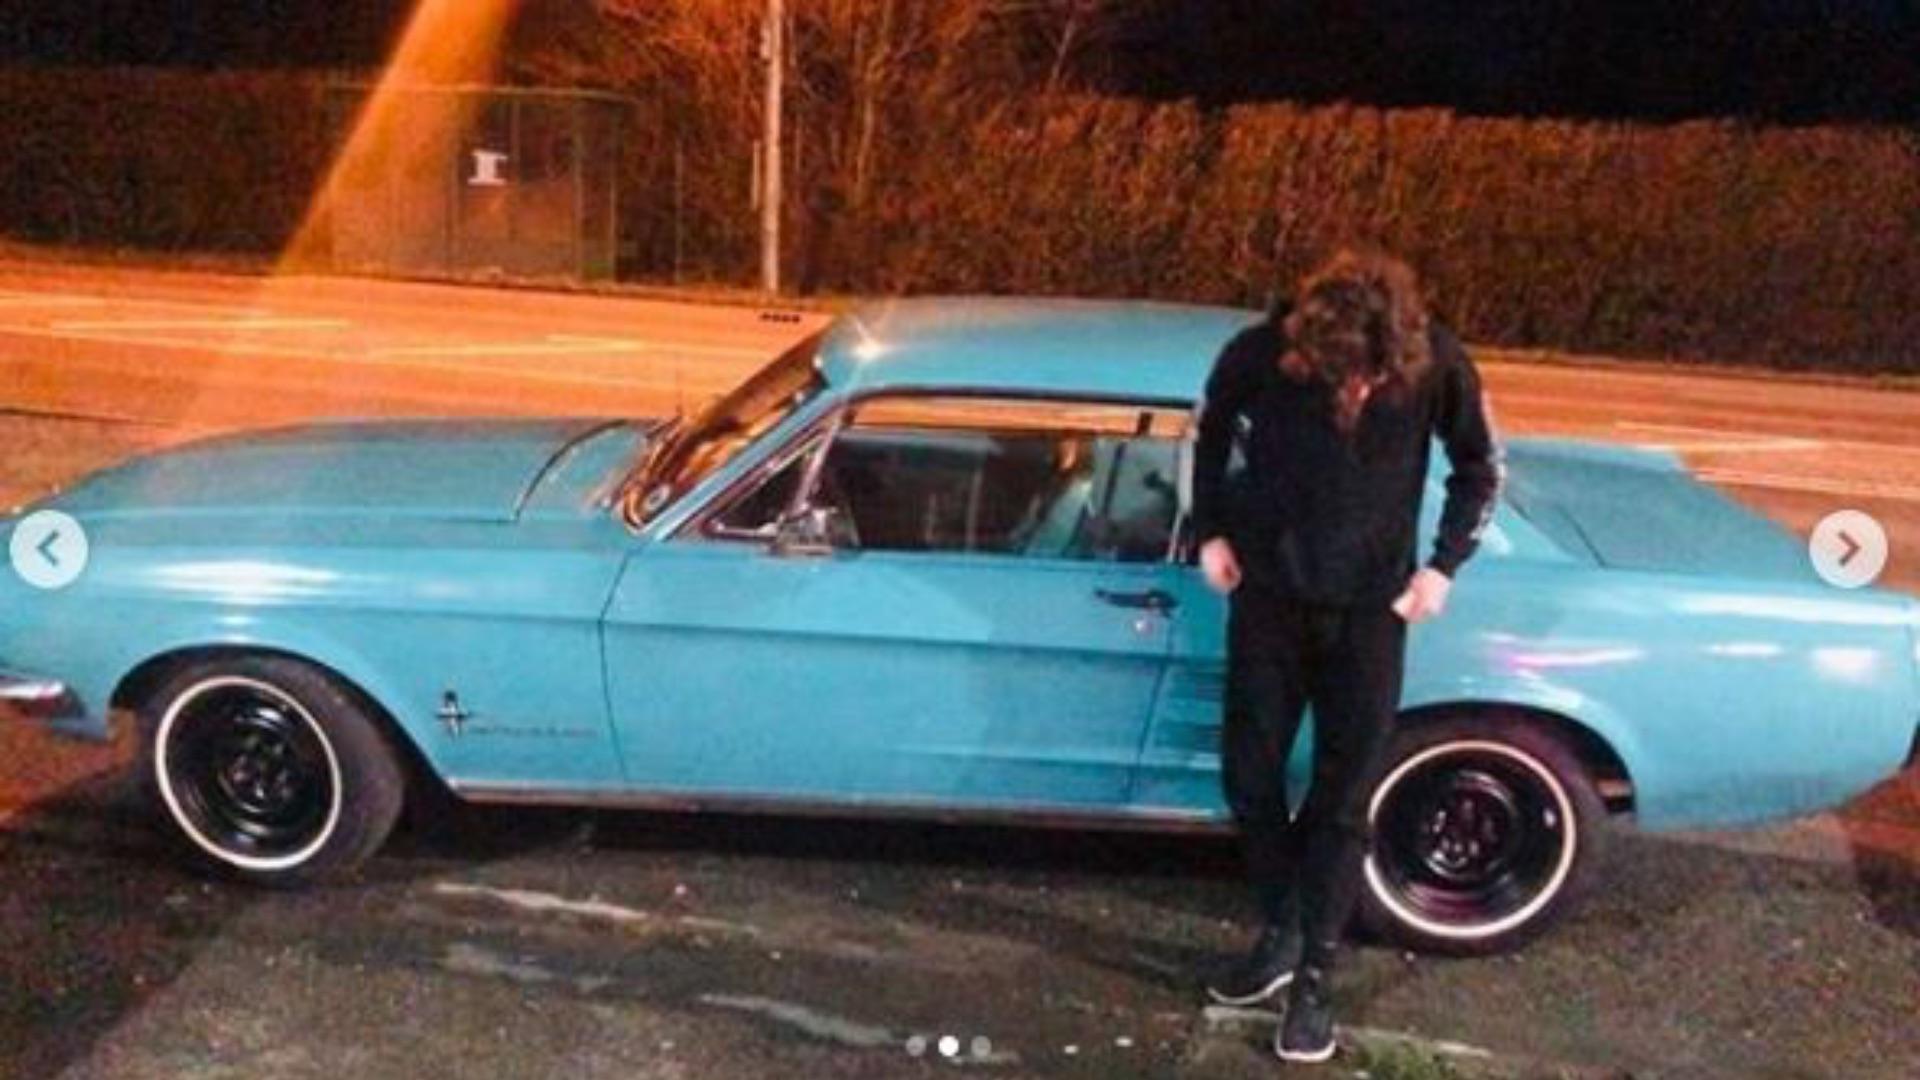 Soap Star Joe Warren-Plant Brings Home Classic Mustang